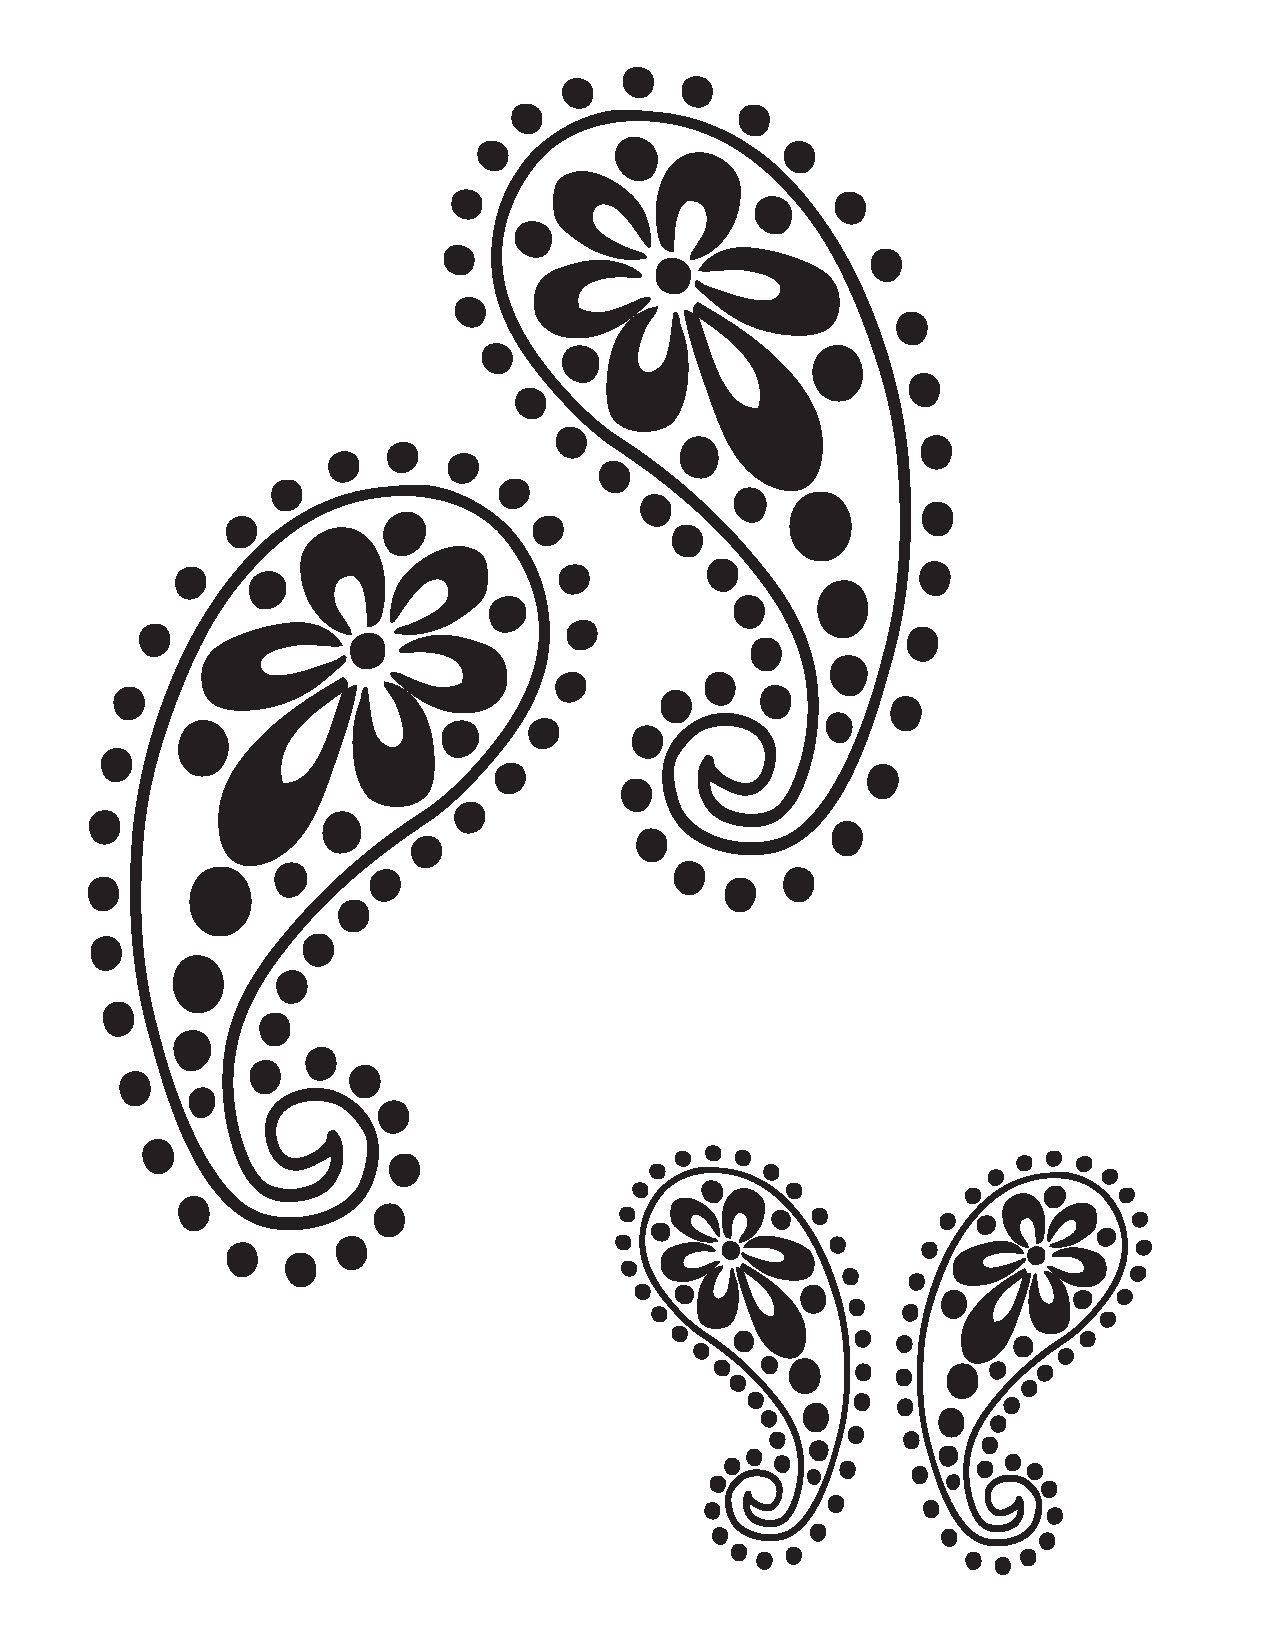 Free Leaf Border Stencil   Stencils Designs Free Printable Downloads ...